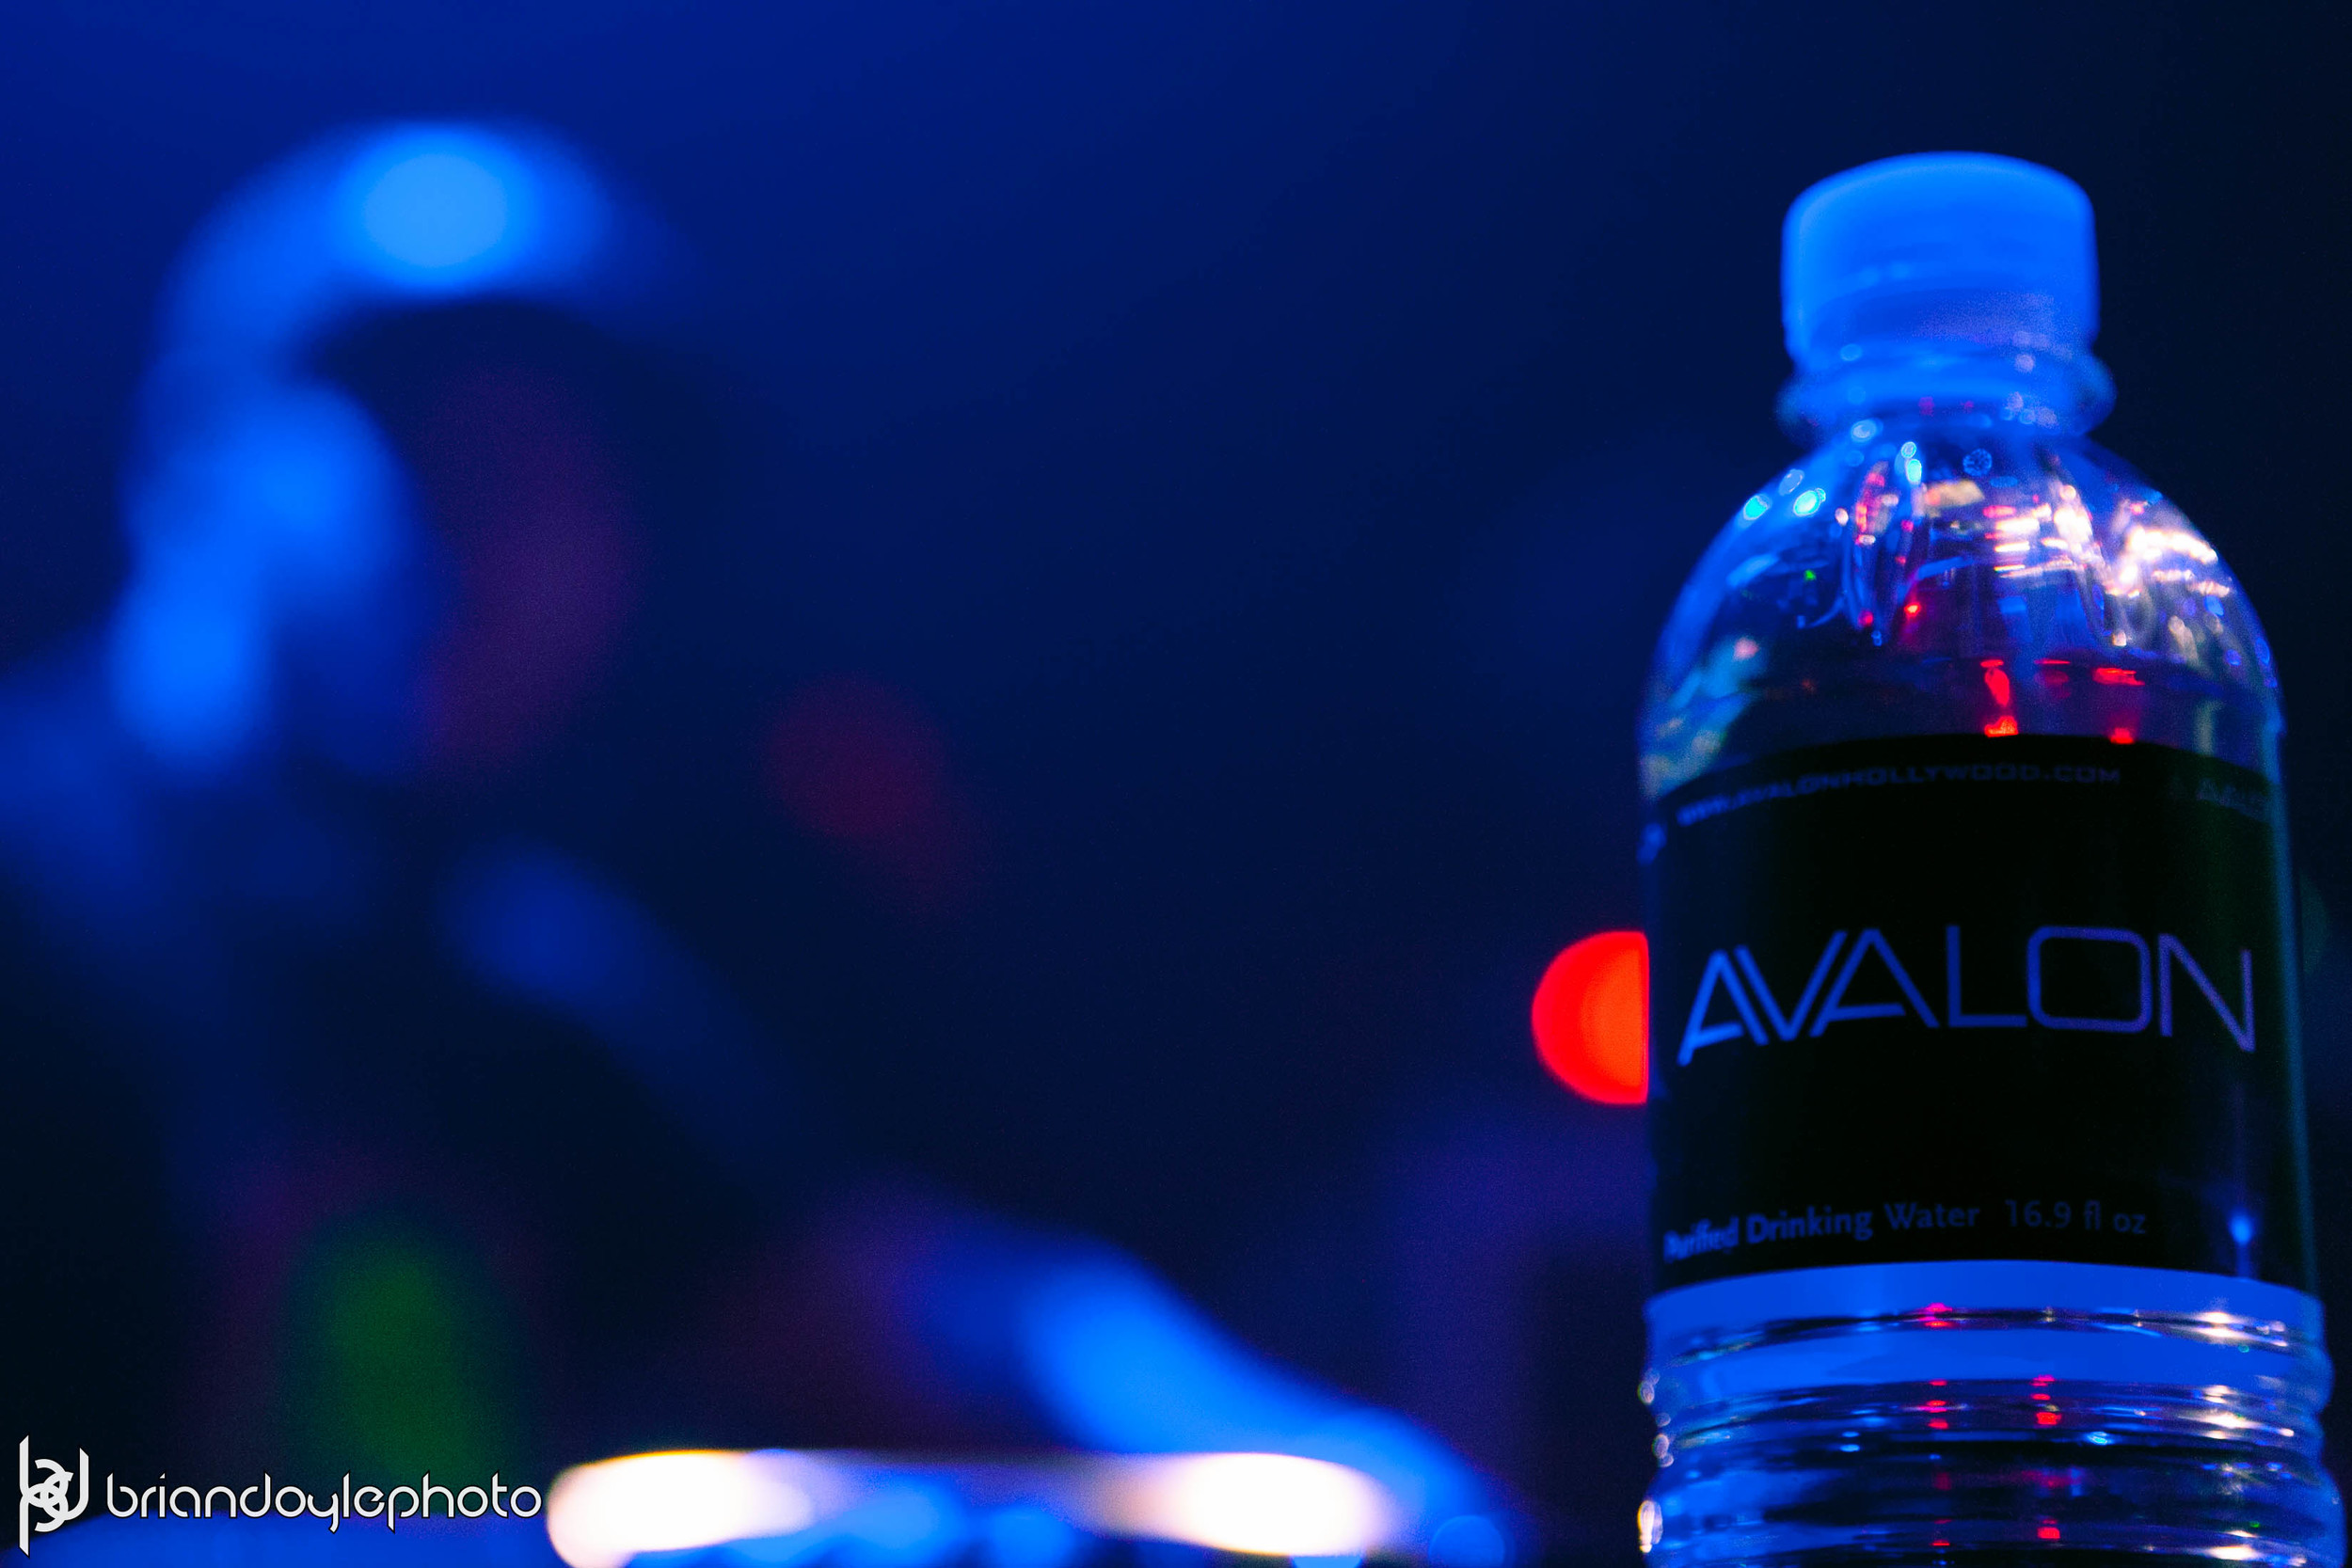 Bro Safari - Black Out Tour @ Avalon bdp 26.09.14-43.jpg